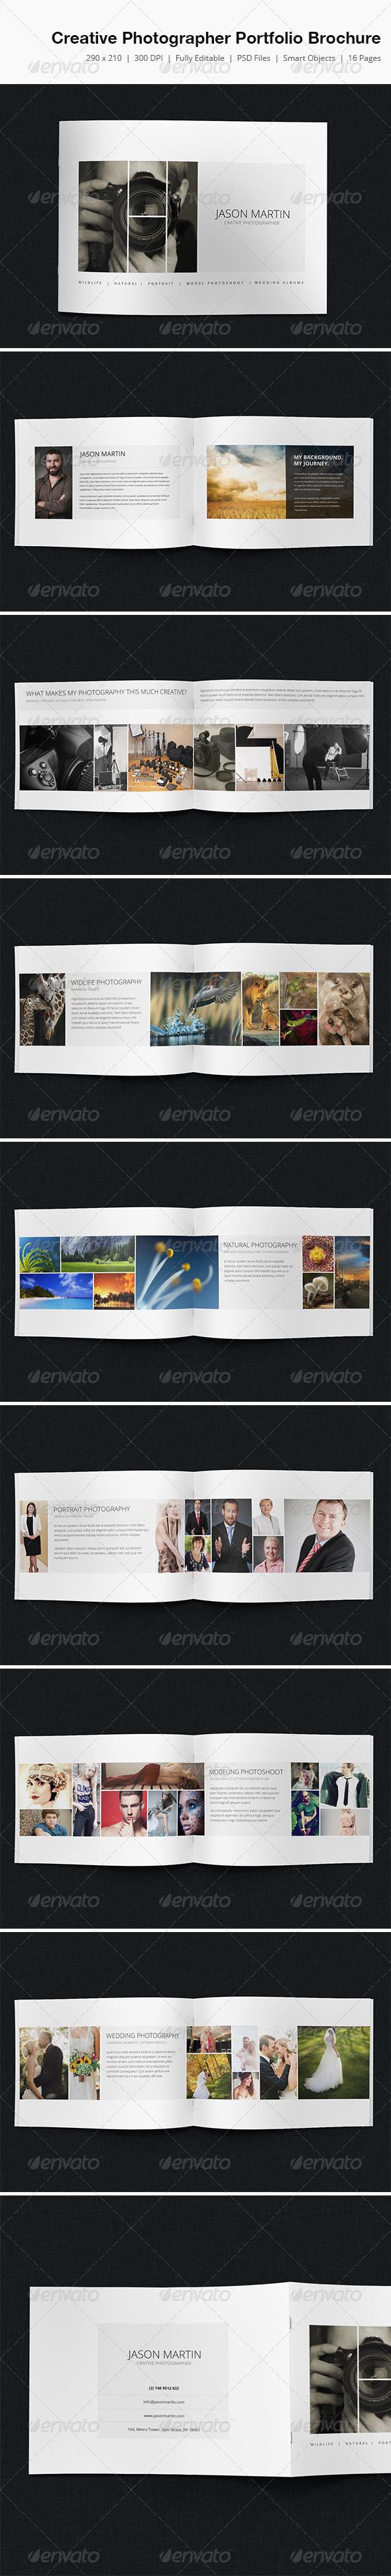 Creative Photographer Portfolio Brochure  - Portfolio Brochures